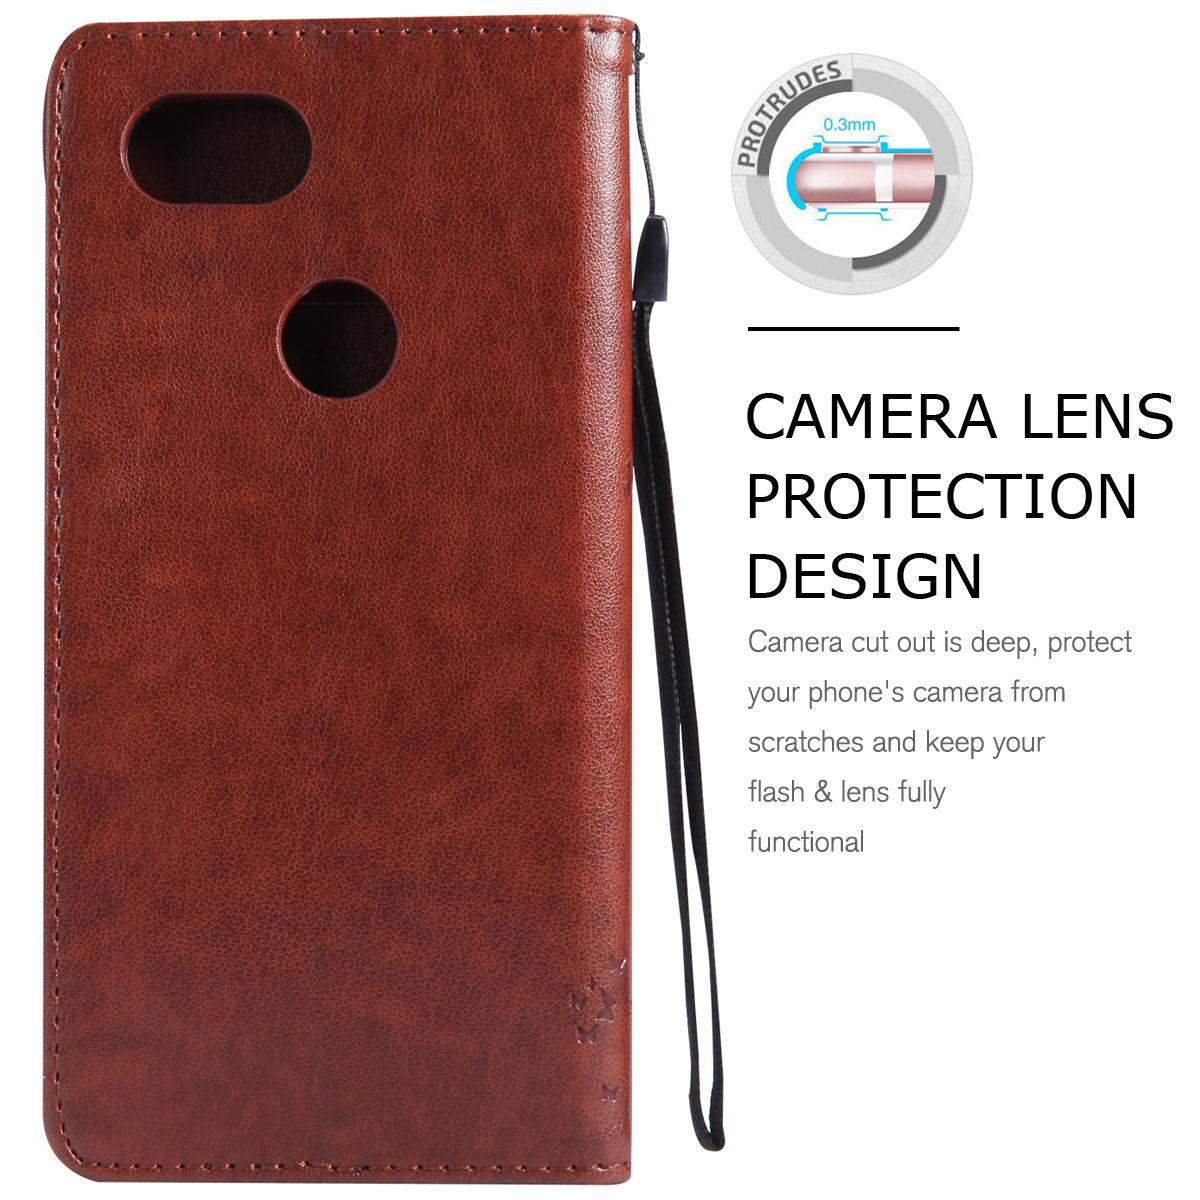 Magnetic-Leather-Credit-Card-Holder-Flip-Case-Cover-For-Google-Pixel-2-2-XL thumbnail 28